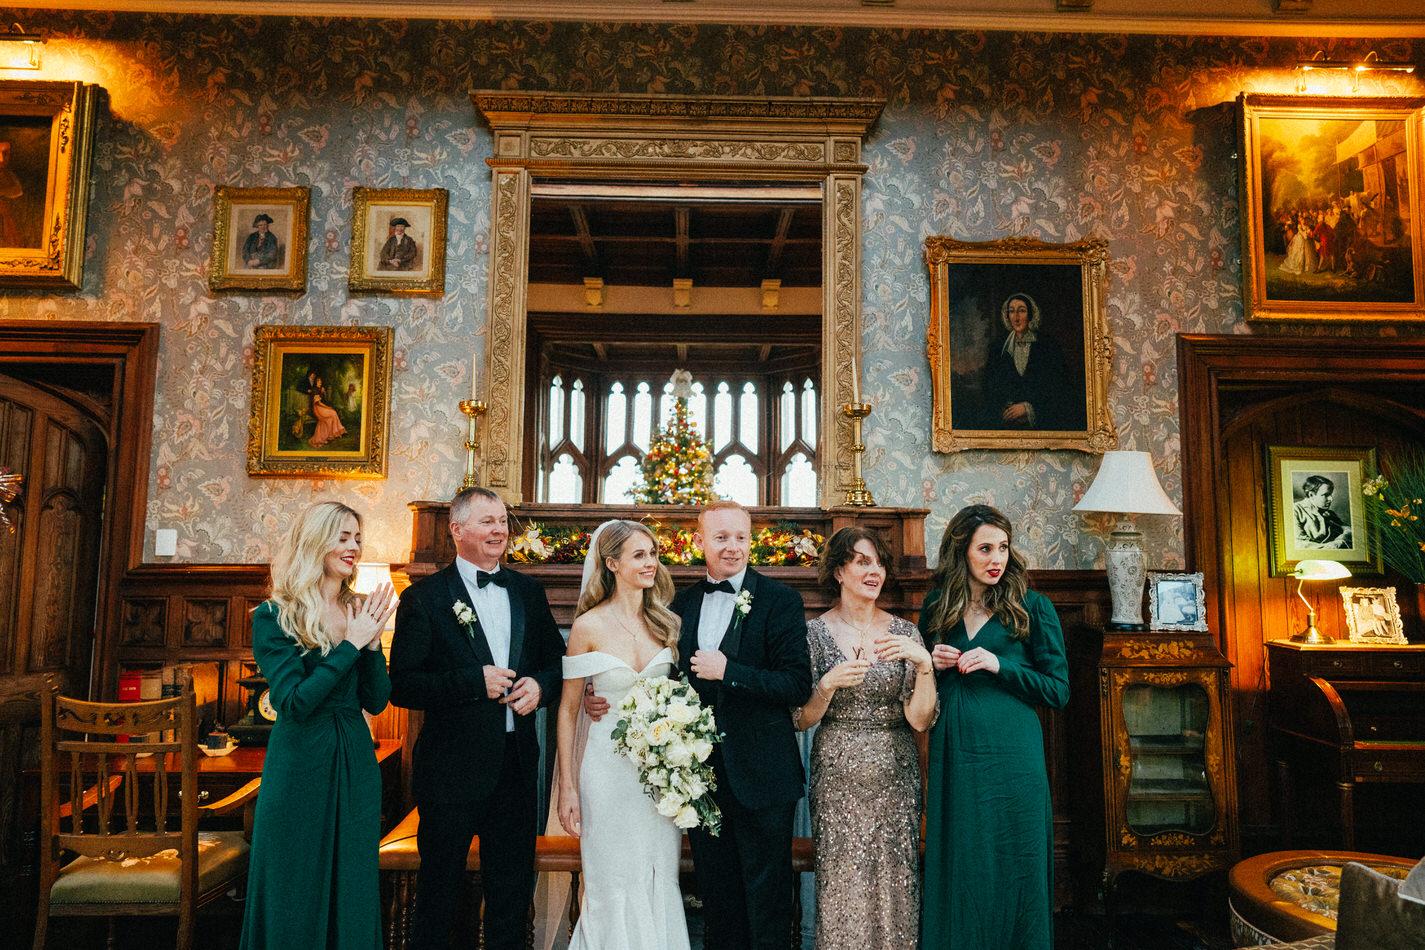 Castle-wedding-ireland-photos- 0239 178